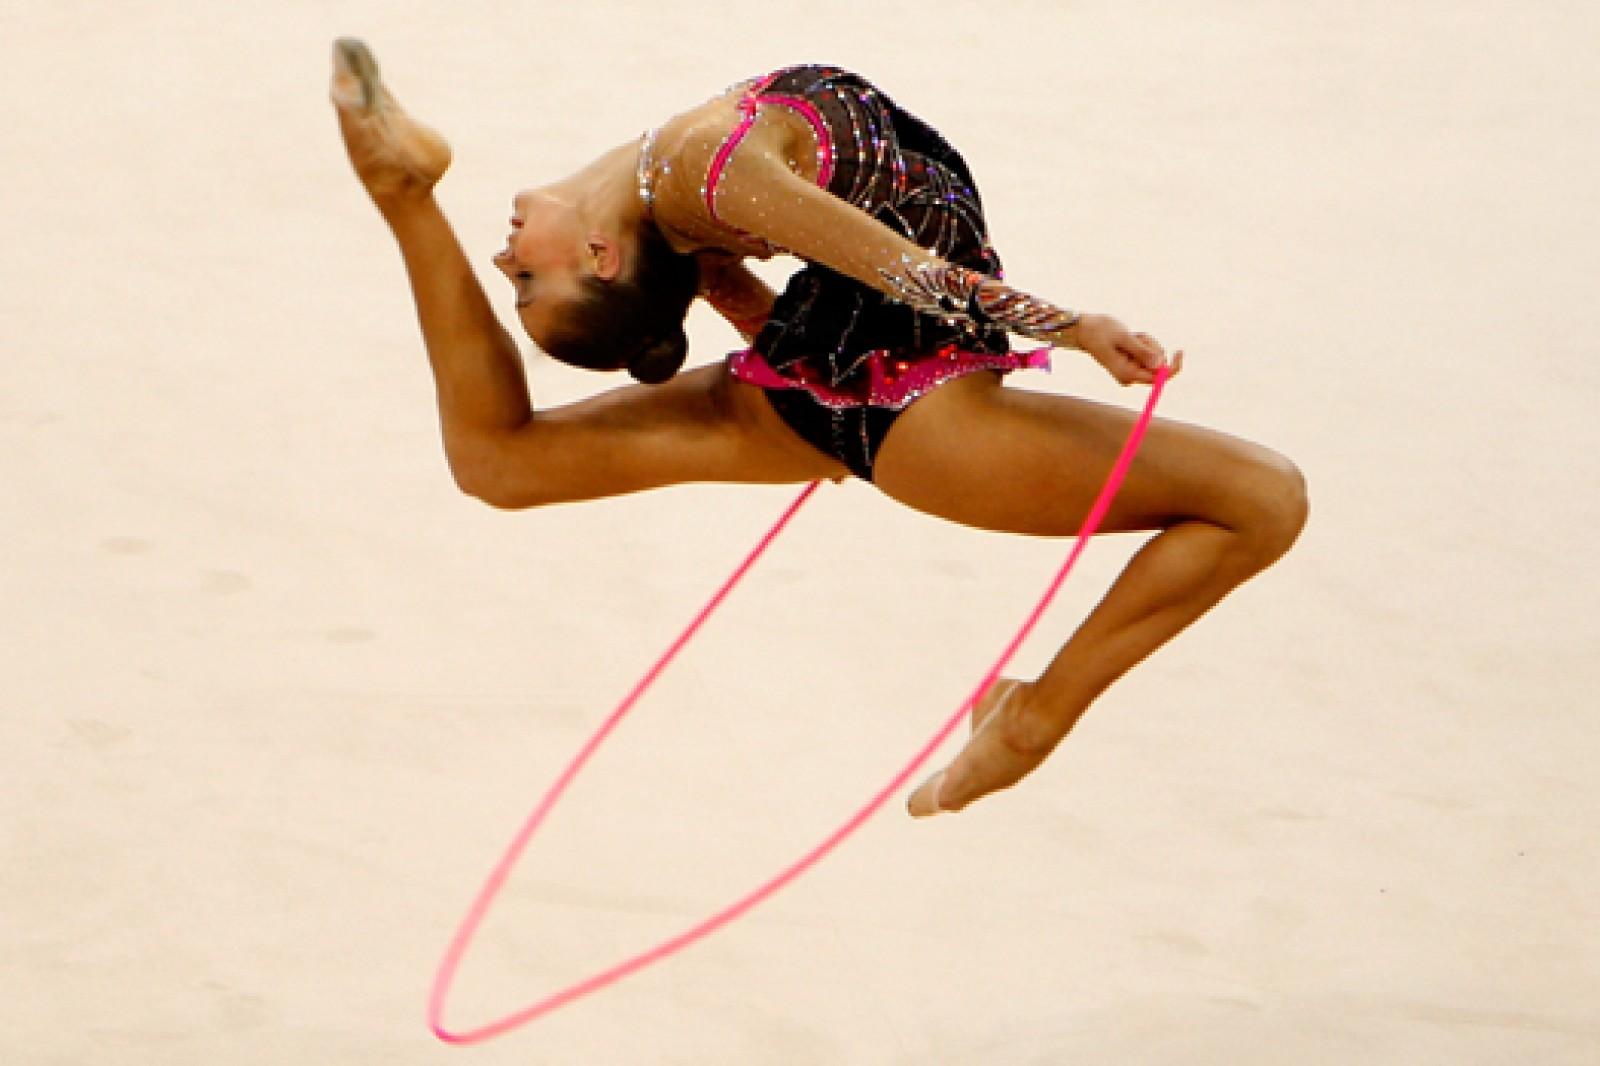 Adult gymnastics lessons cannot built